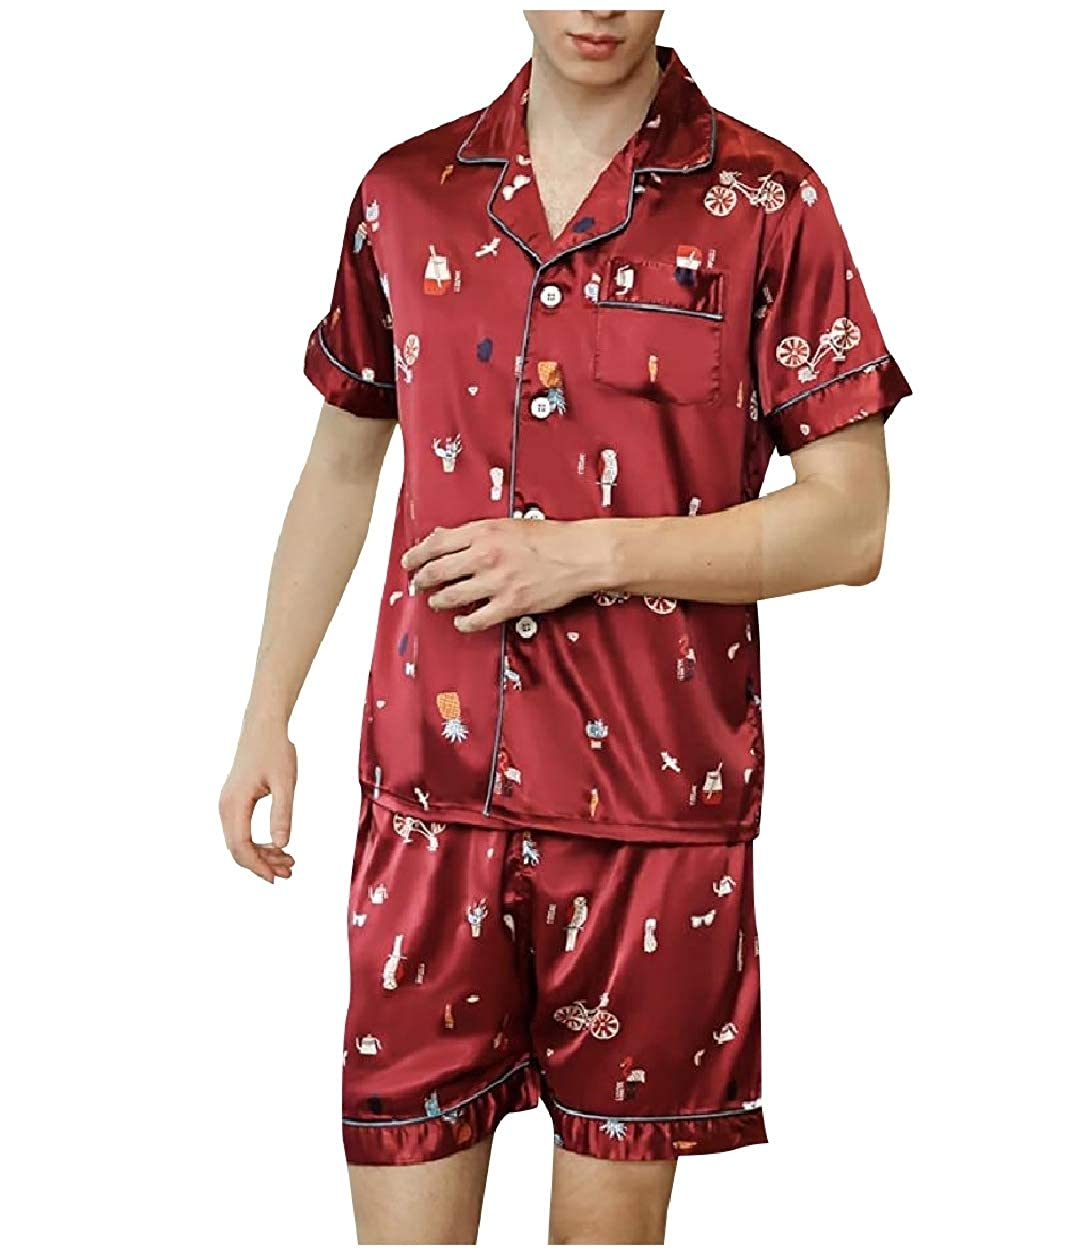 Abetteric Men 2pcs Set Satin Printing Pattern Notch Lapel Sleepwear Pjs Set